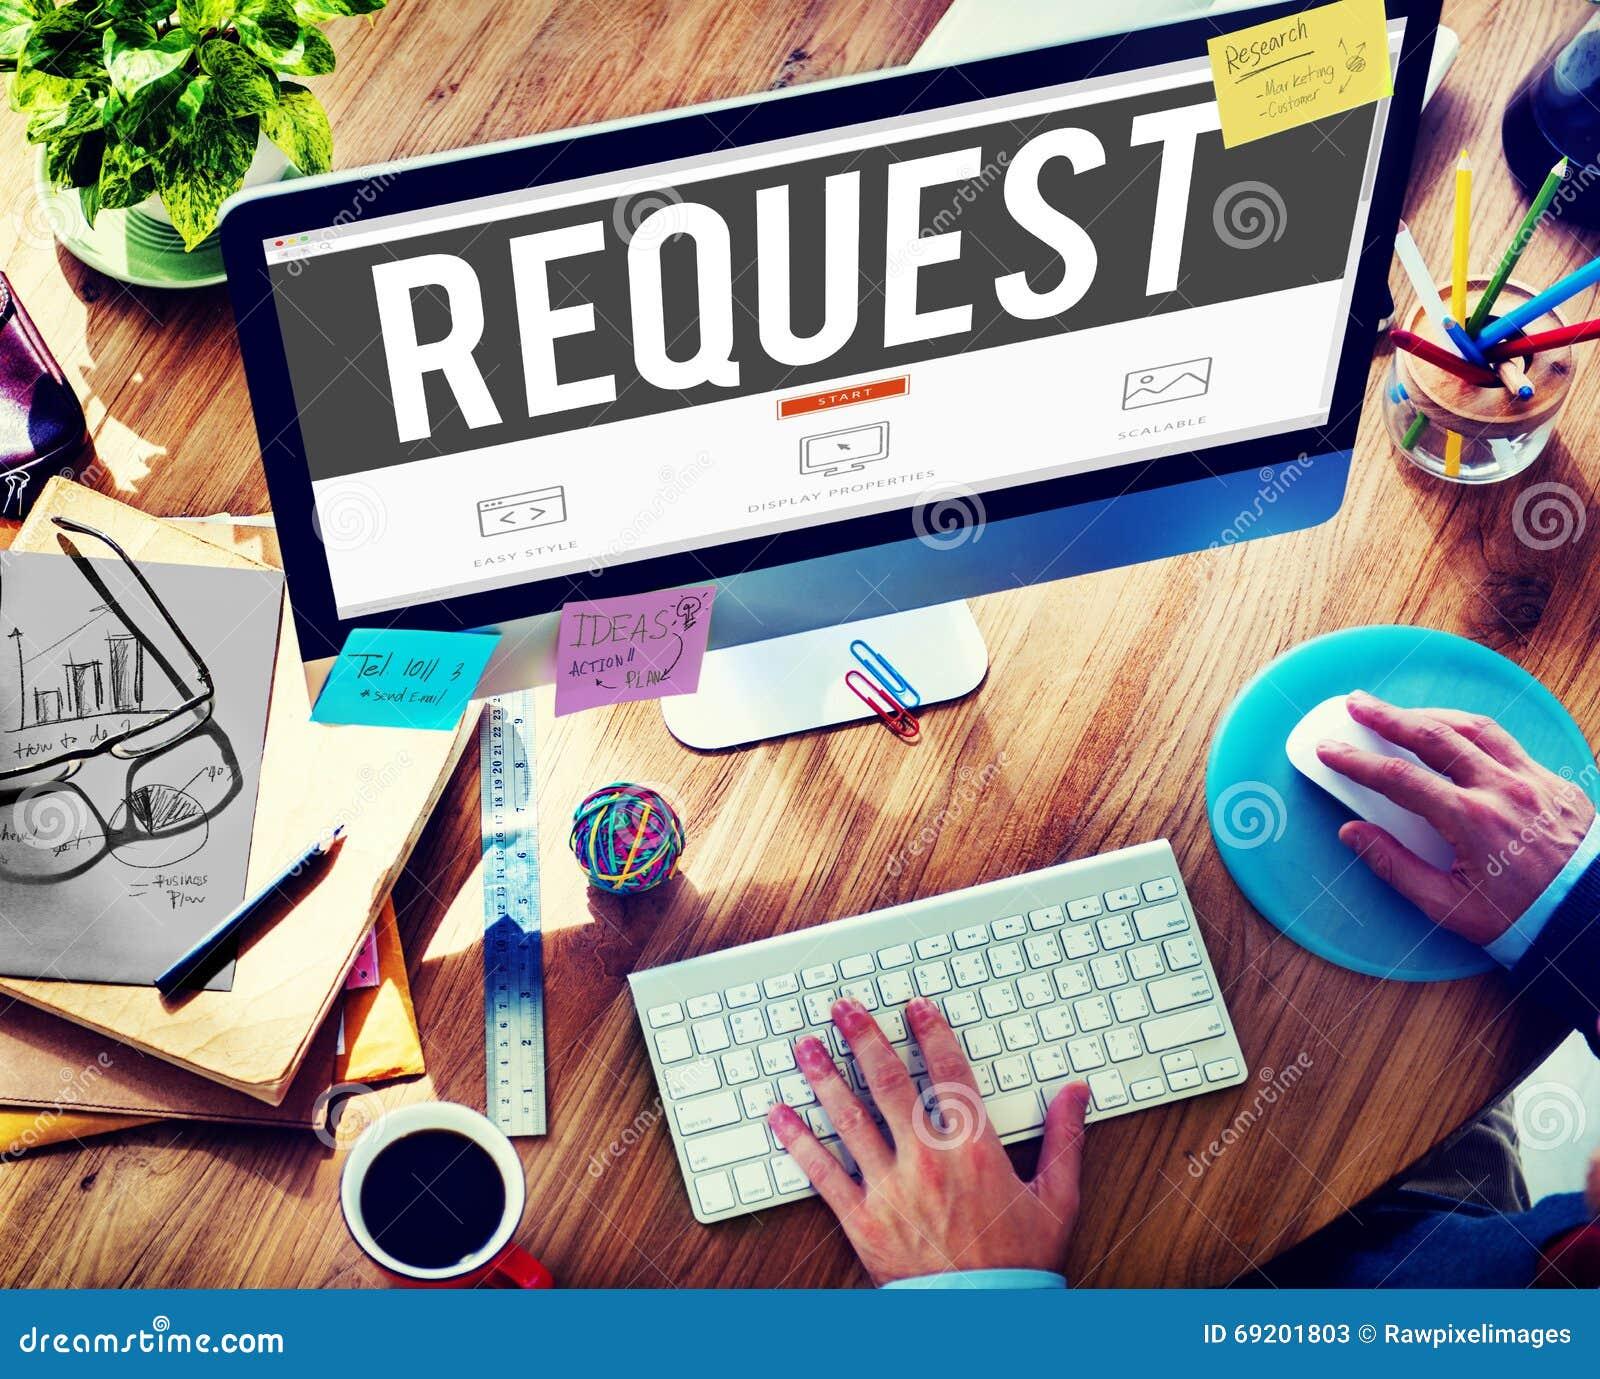 Request Requirement Desire Order Demand Concept